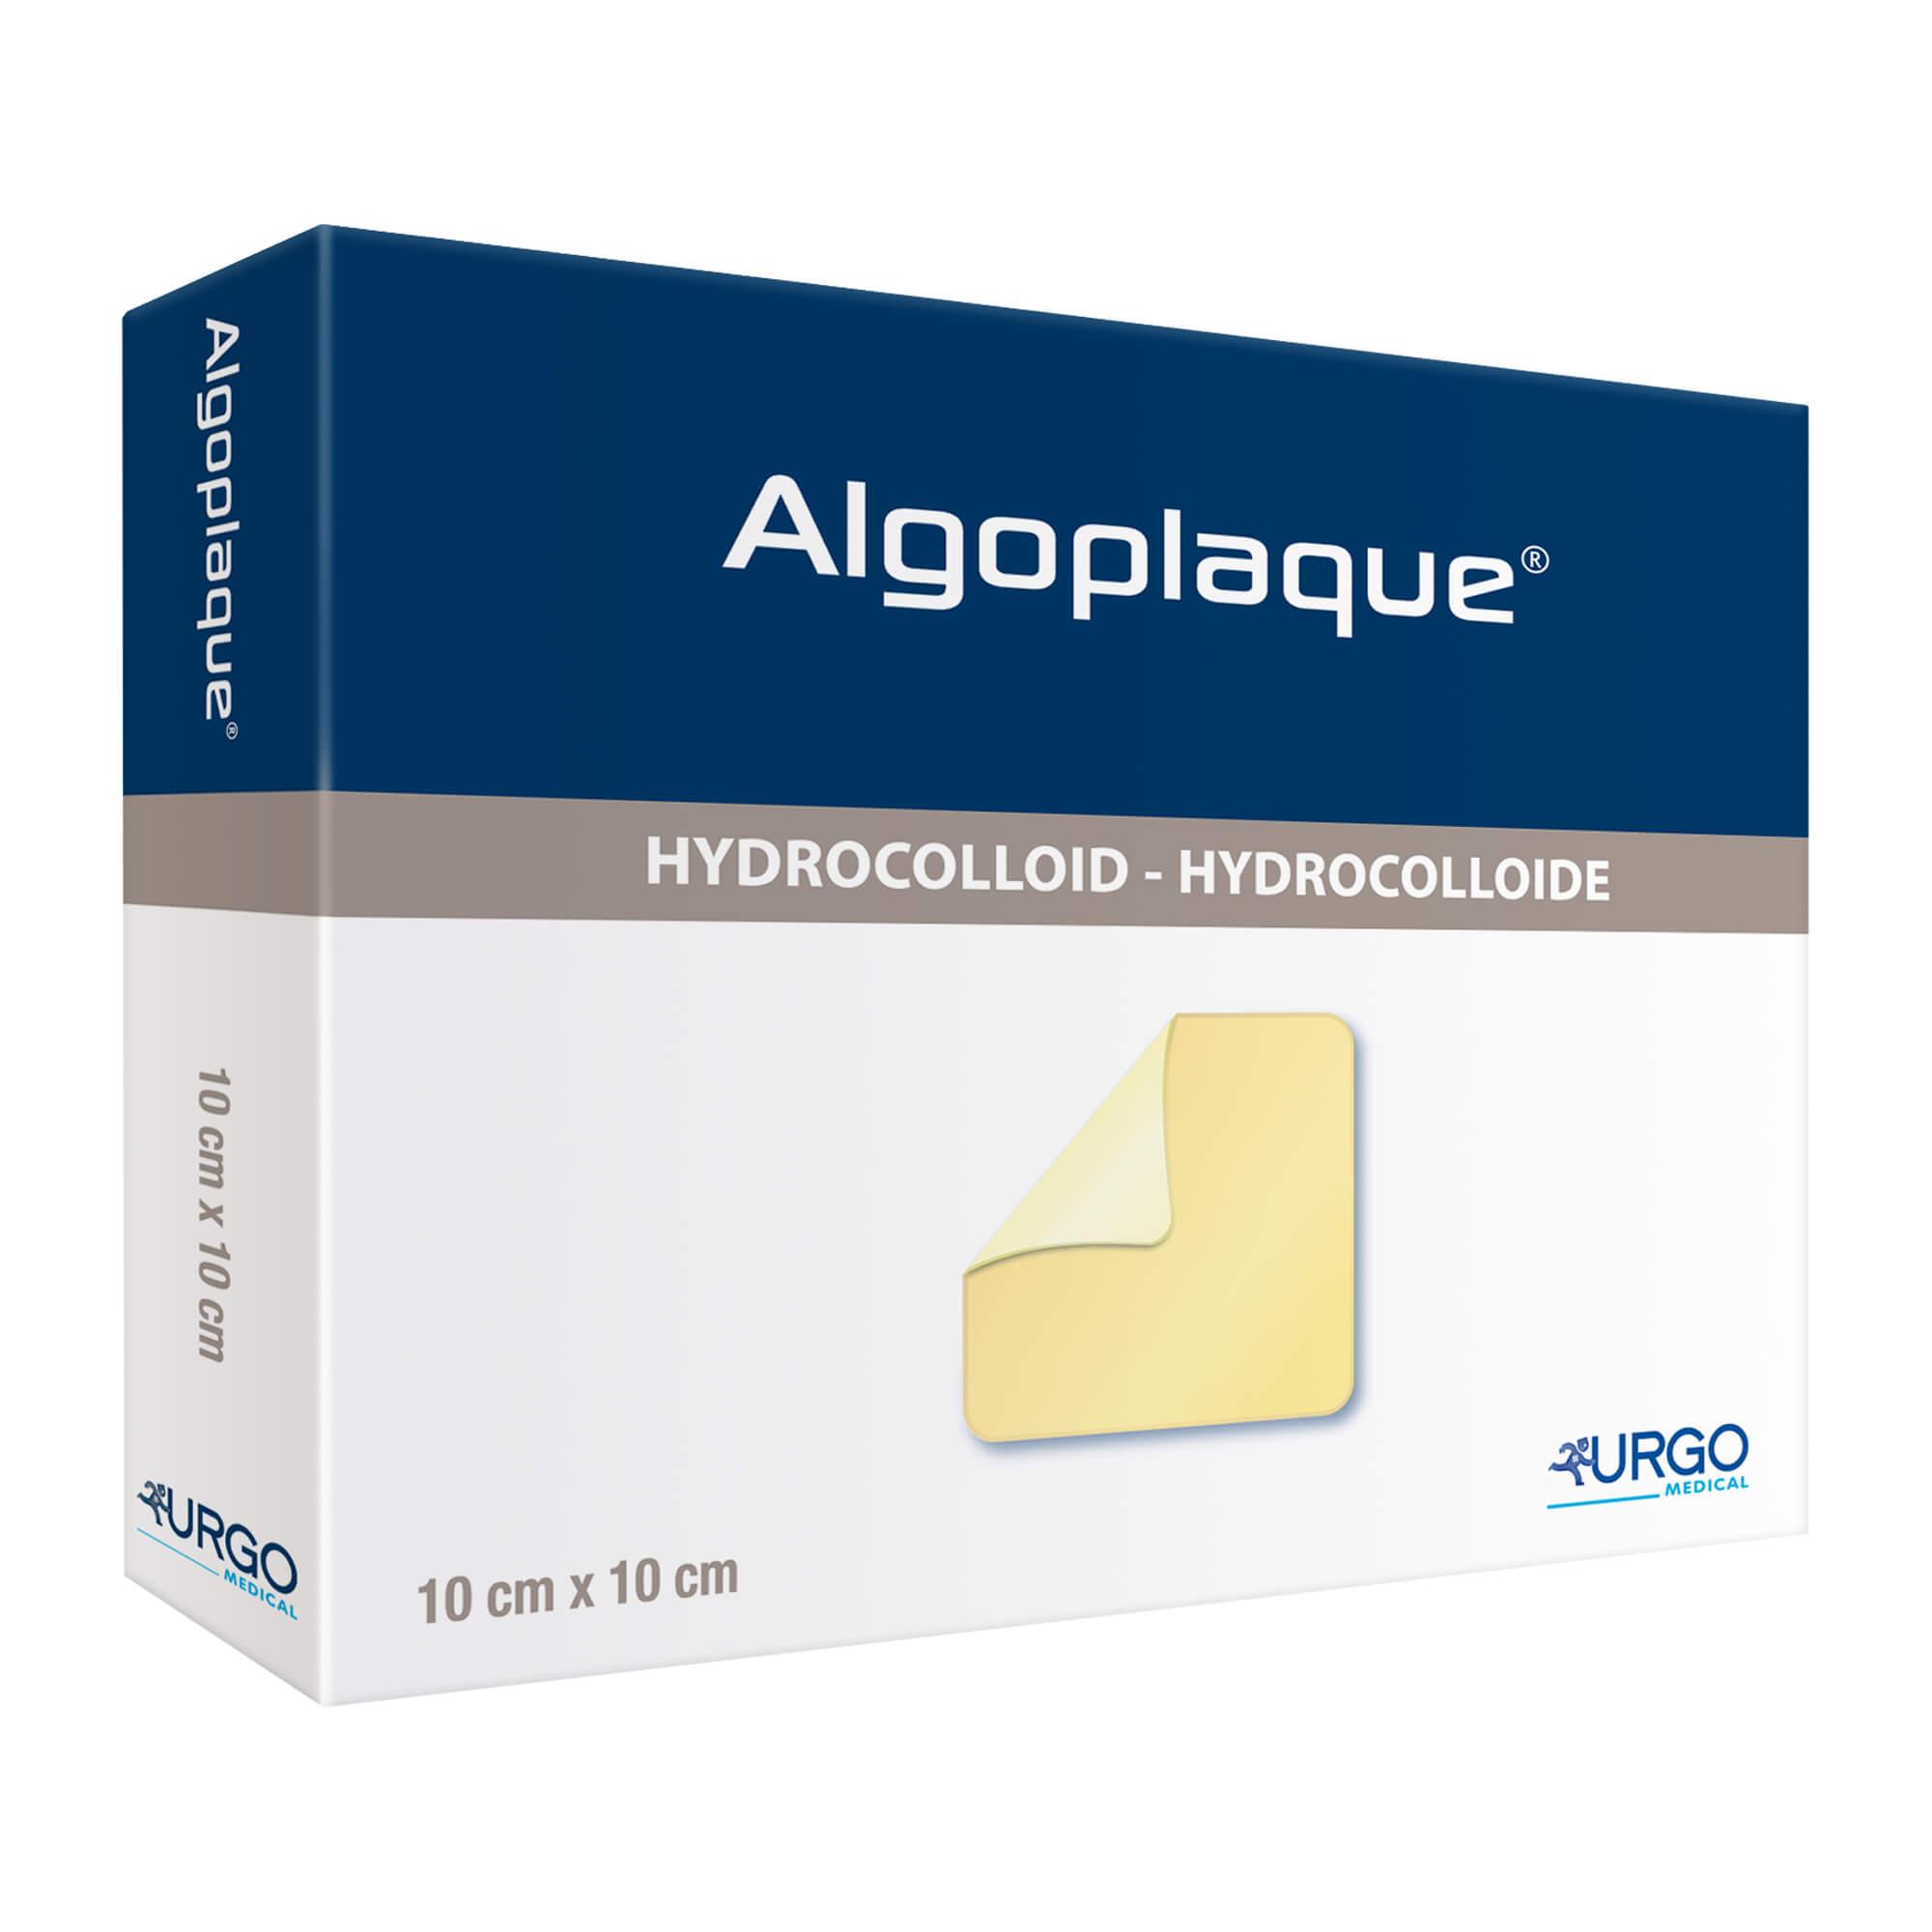 Algoplaque 10x10 cm flexibler Hydrokolloidverband